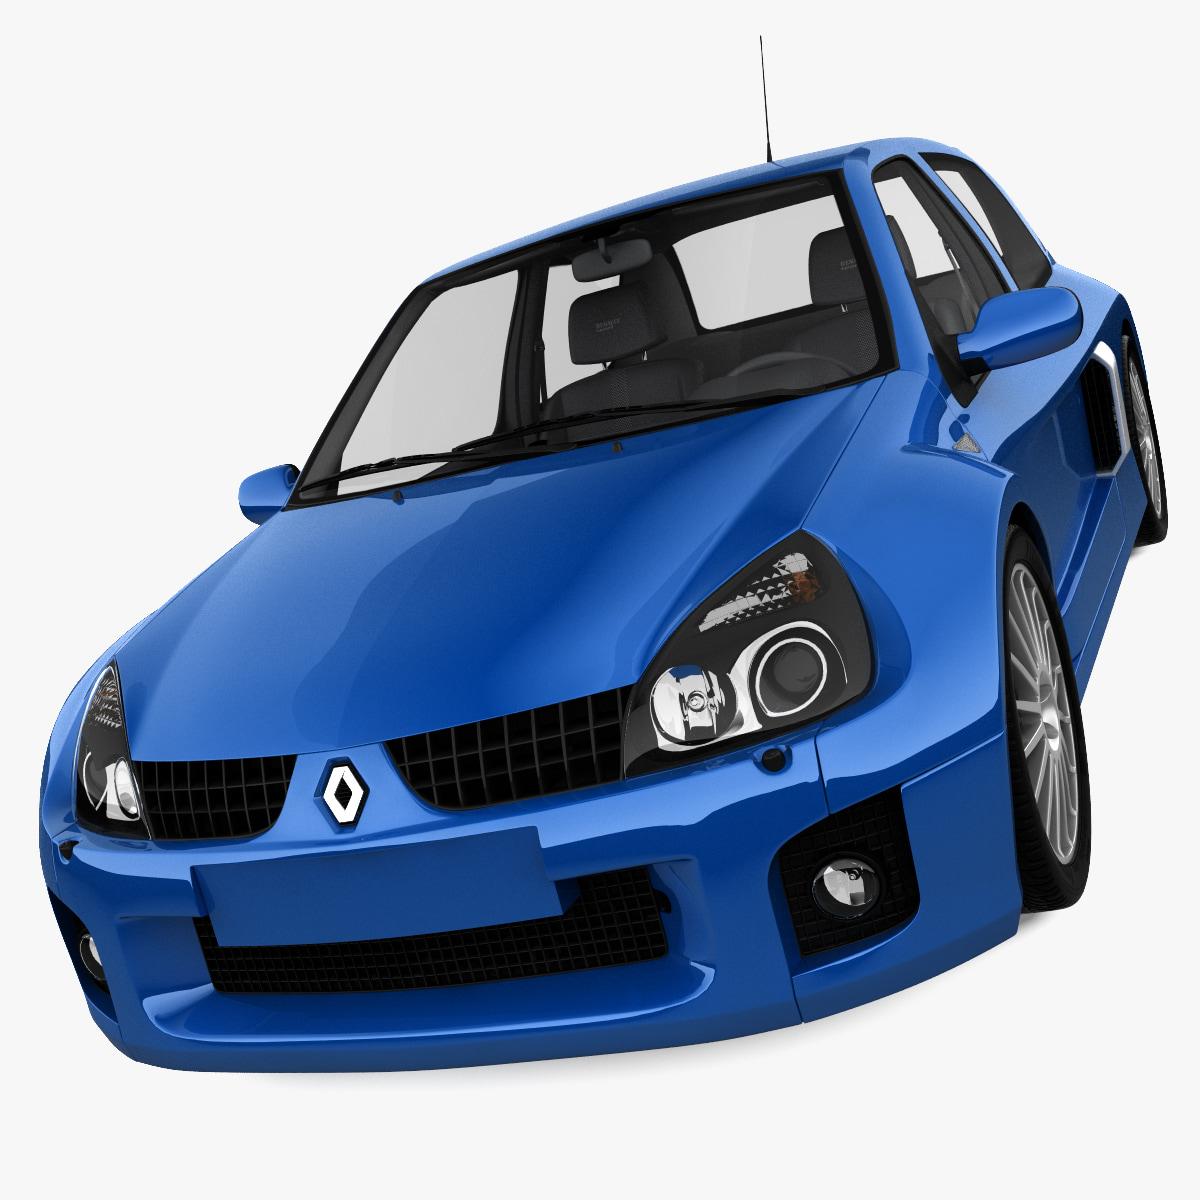 Renault_Clio_Sport_00.jpg